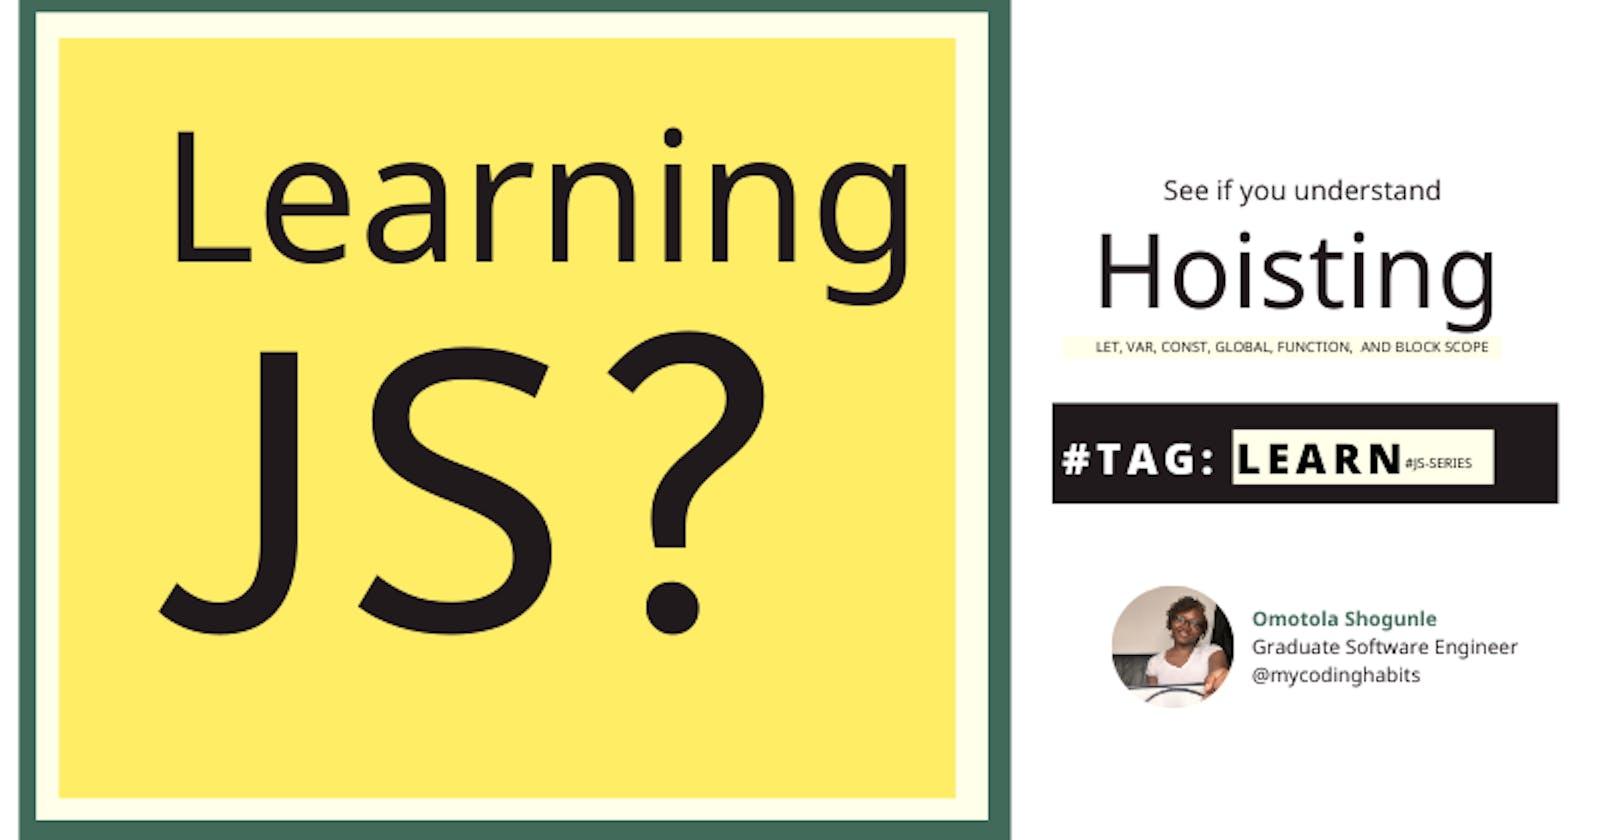 Learning JS? Topic: Hoisting